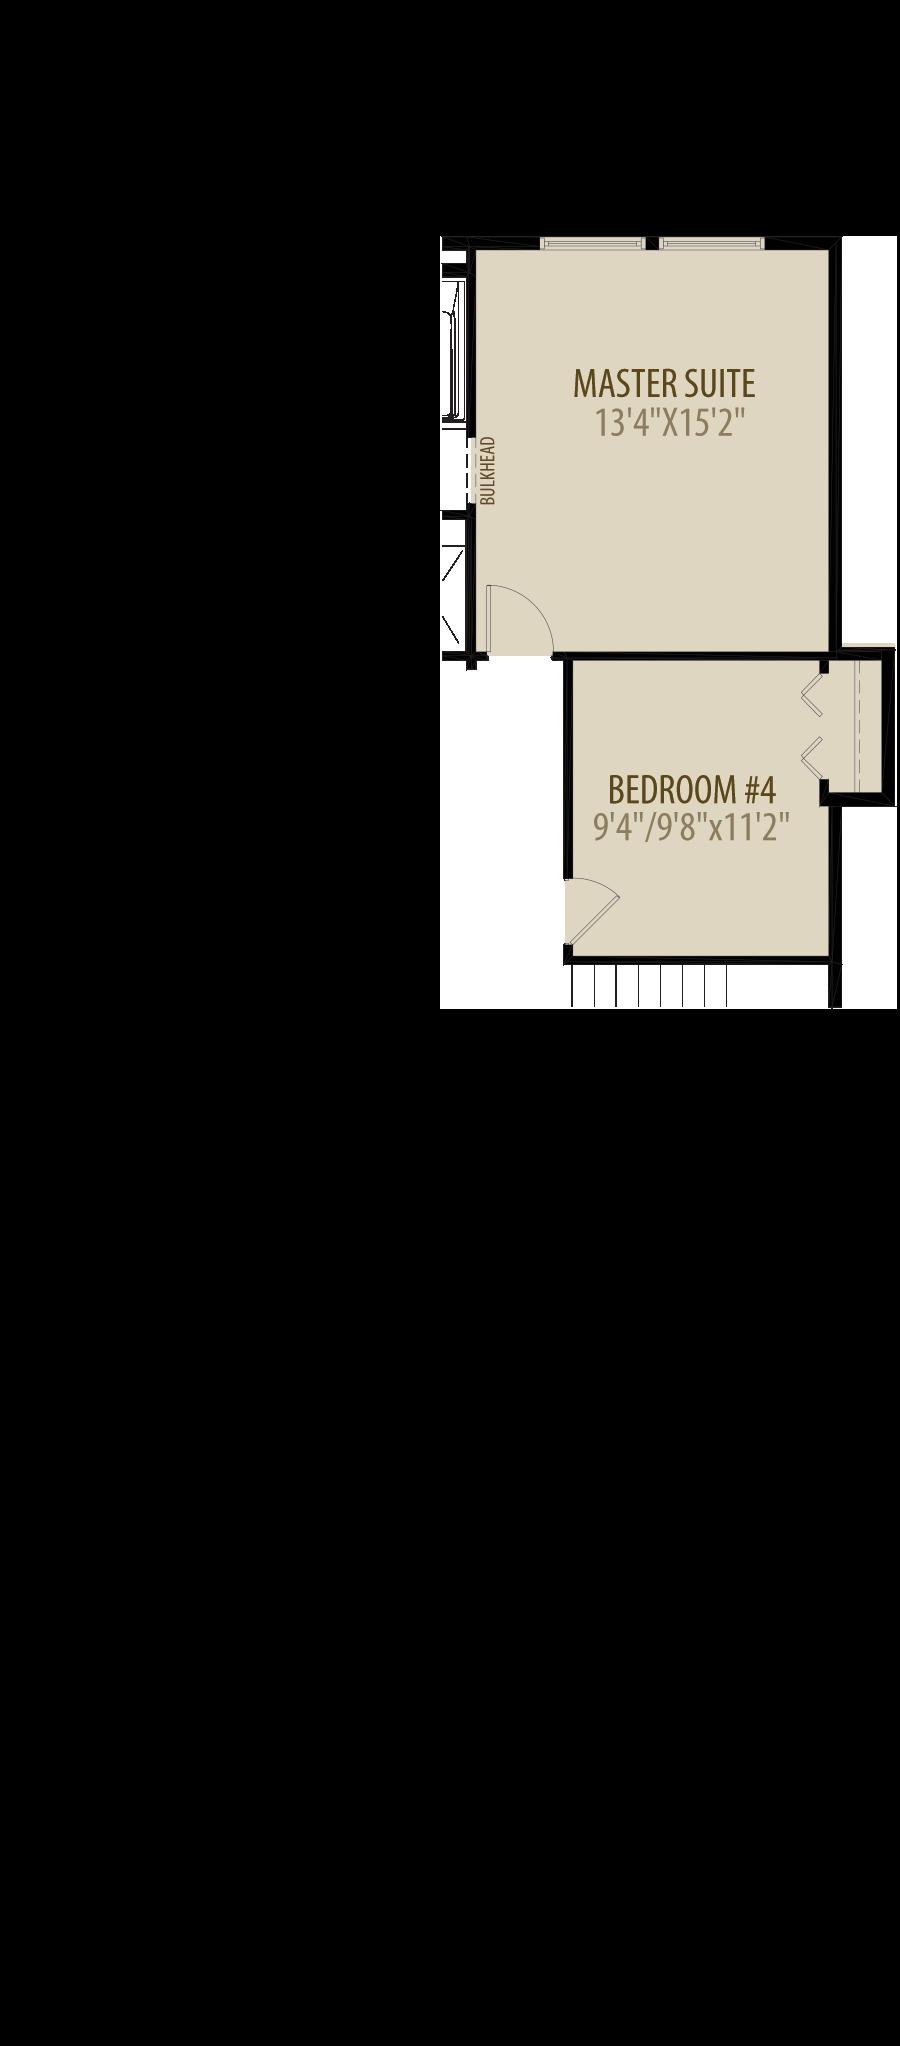 Alt Optional 4th Bedroom adds 132 sq ft